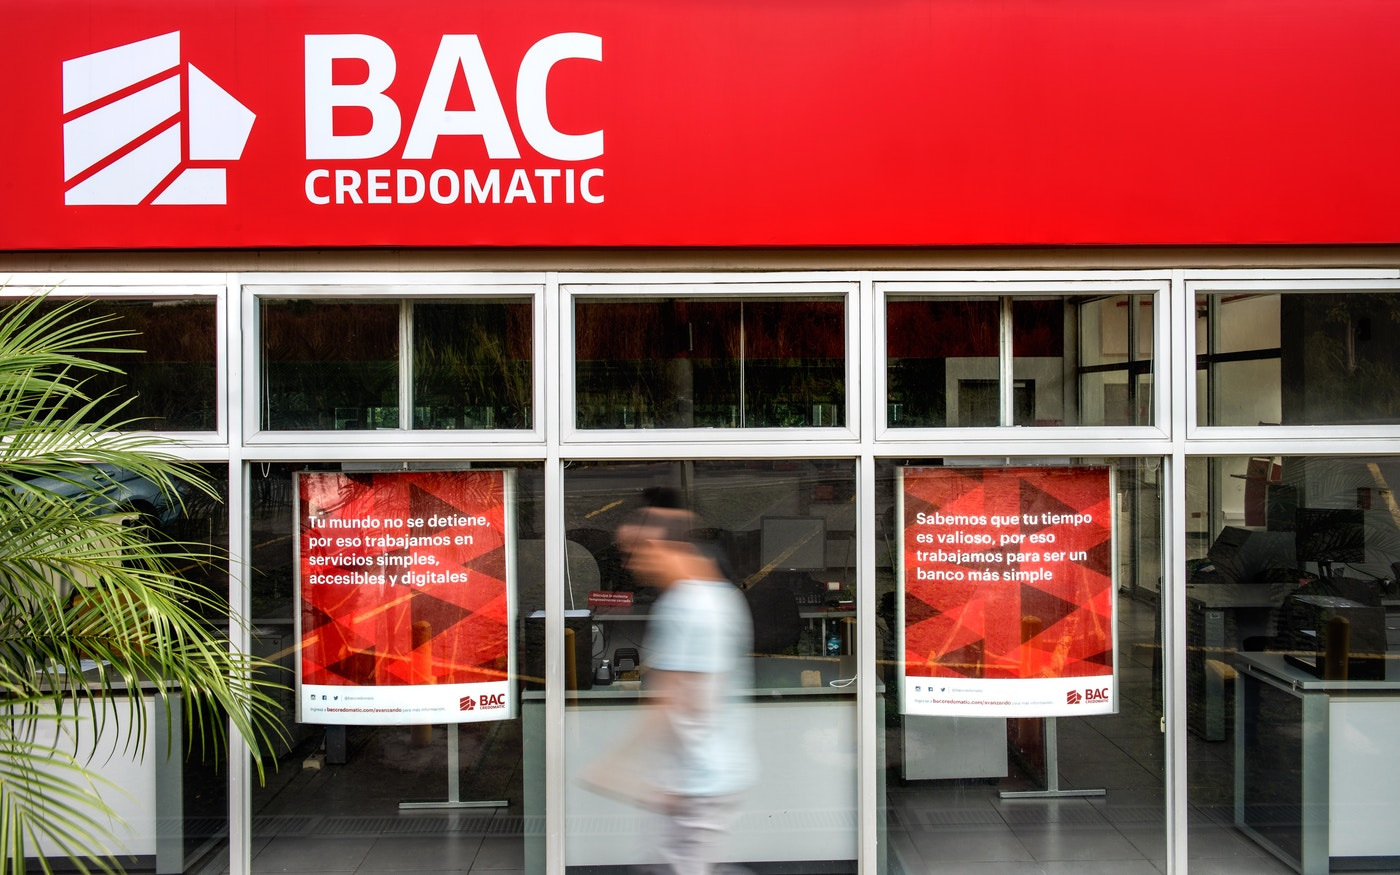 BAC Credomatic storefront